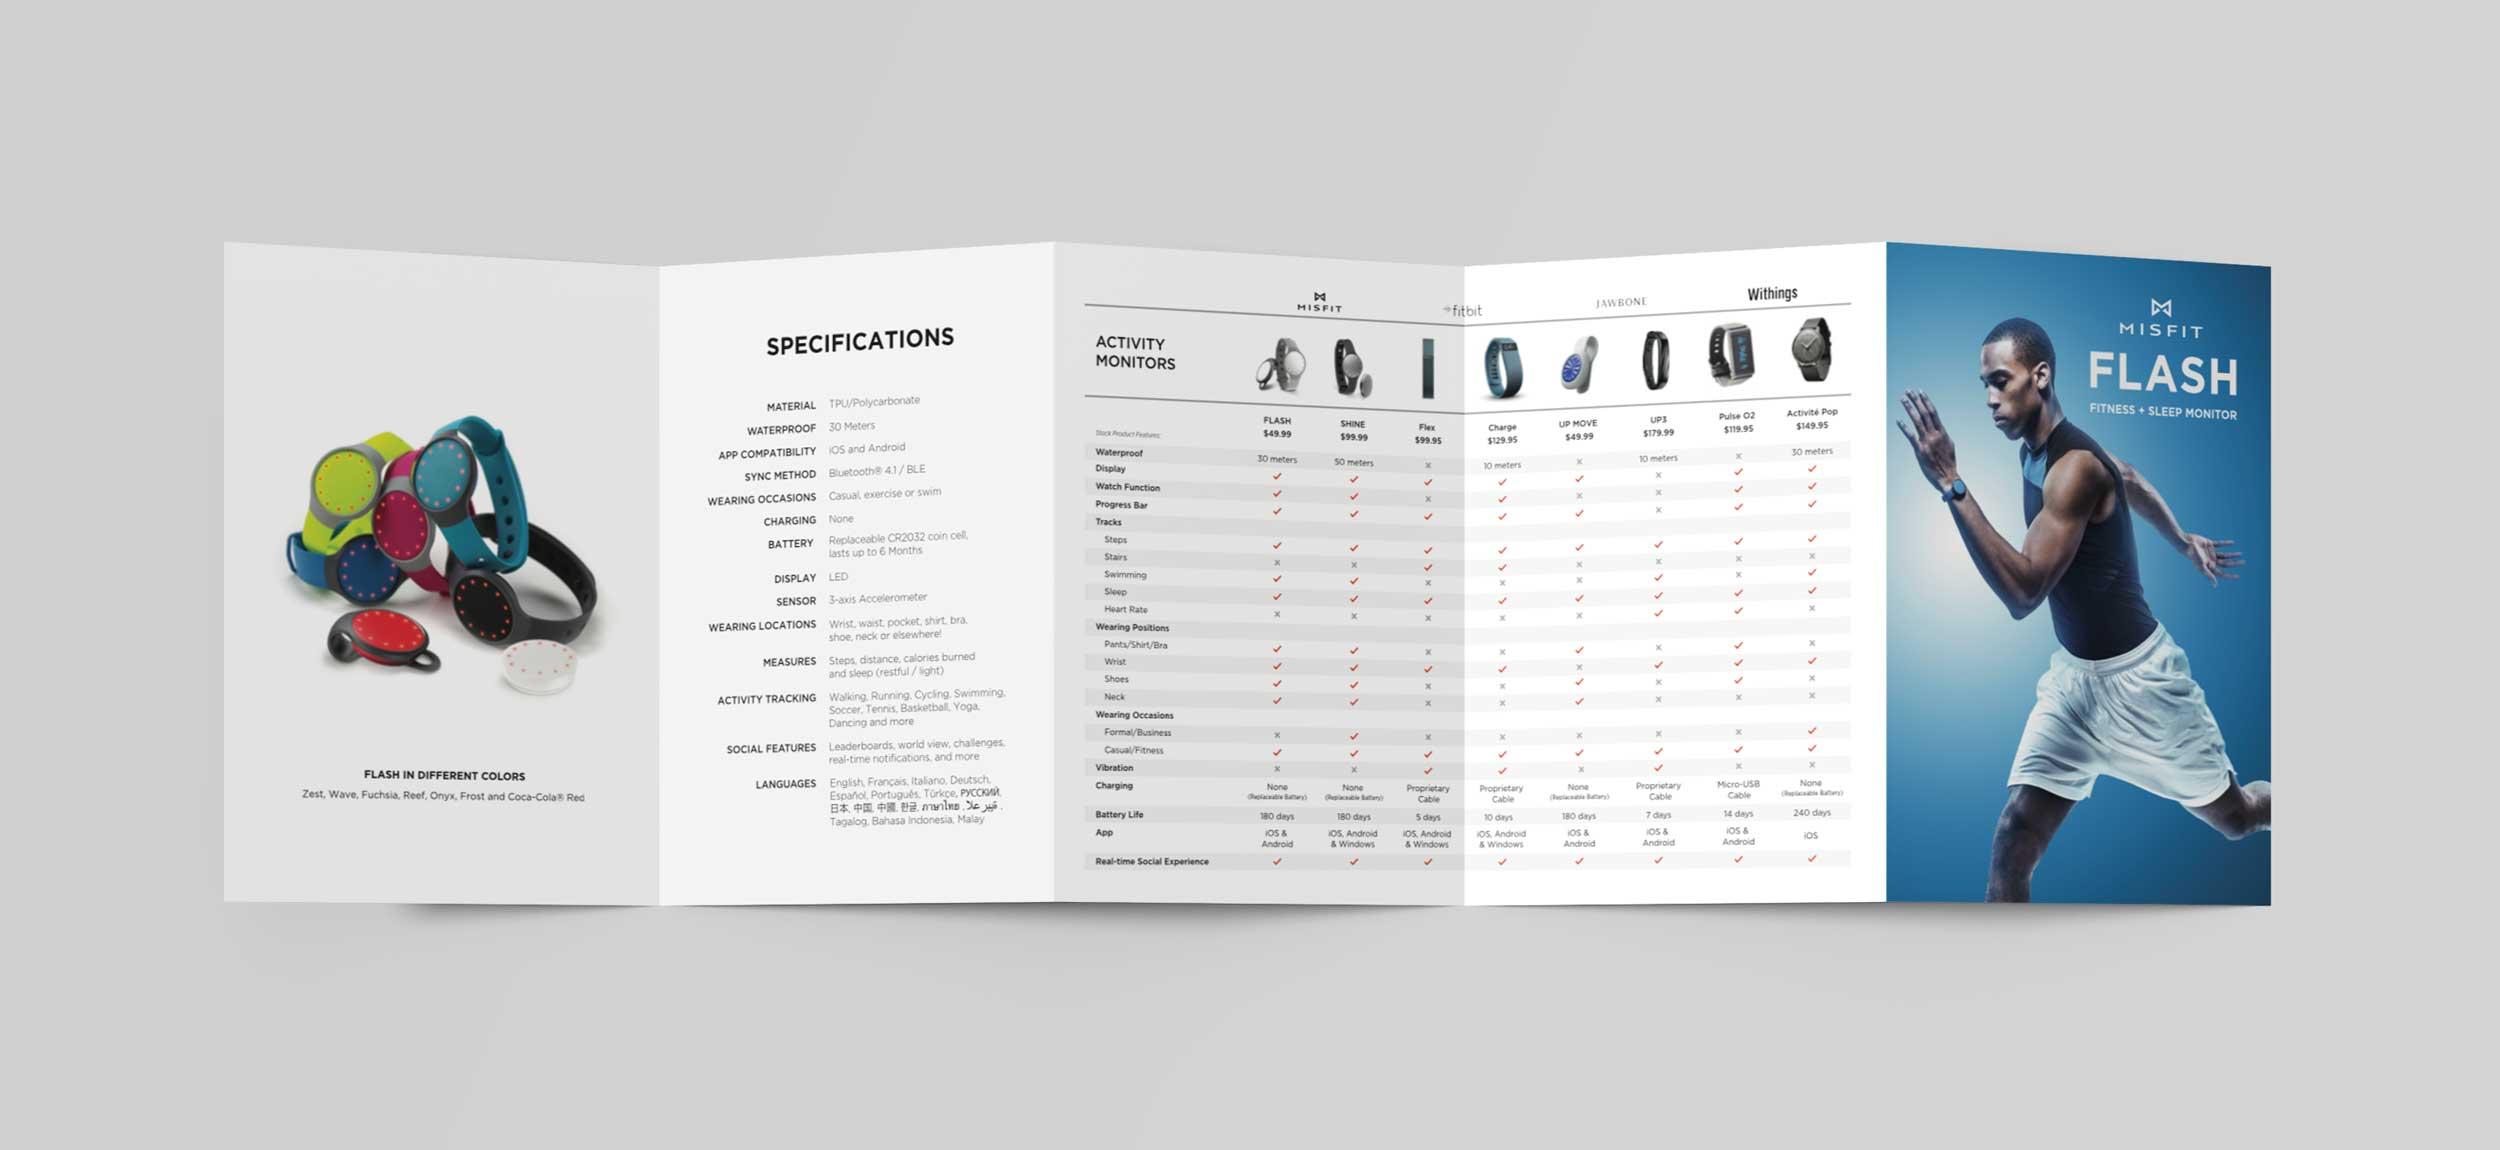 Misfit Flash Brochure, Side 1